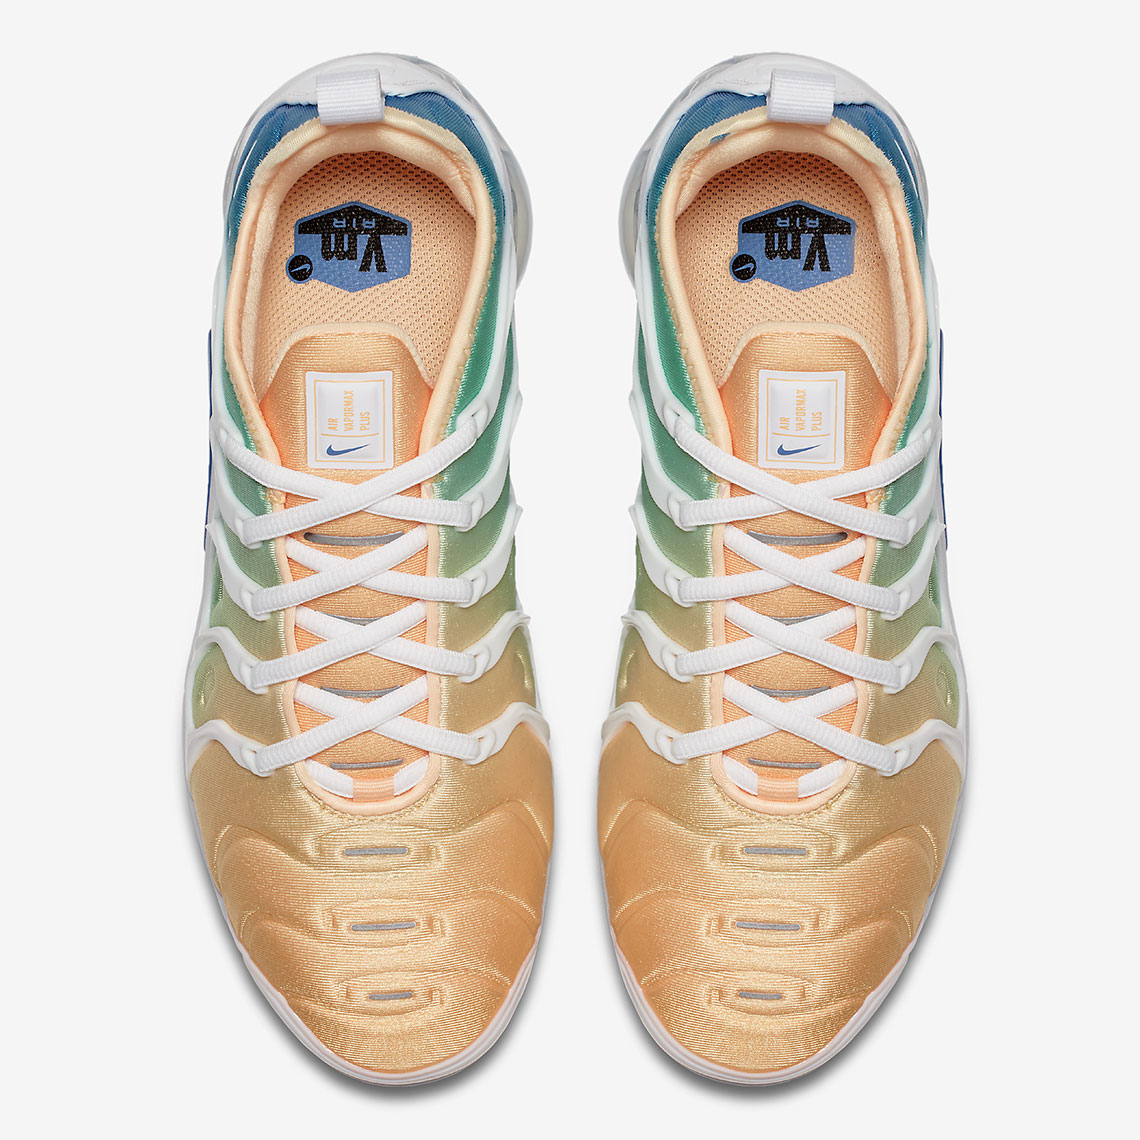 superior quality 2a4d3 76d6b Nike Vapormax Plus Women's AO4550-100 | SneakerNews.Com